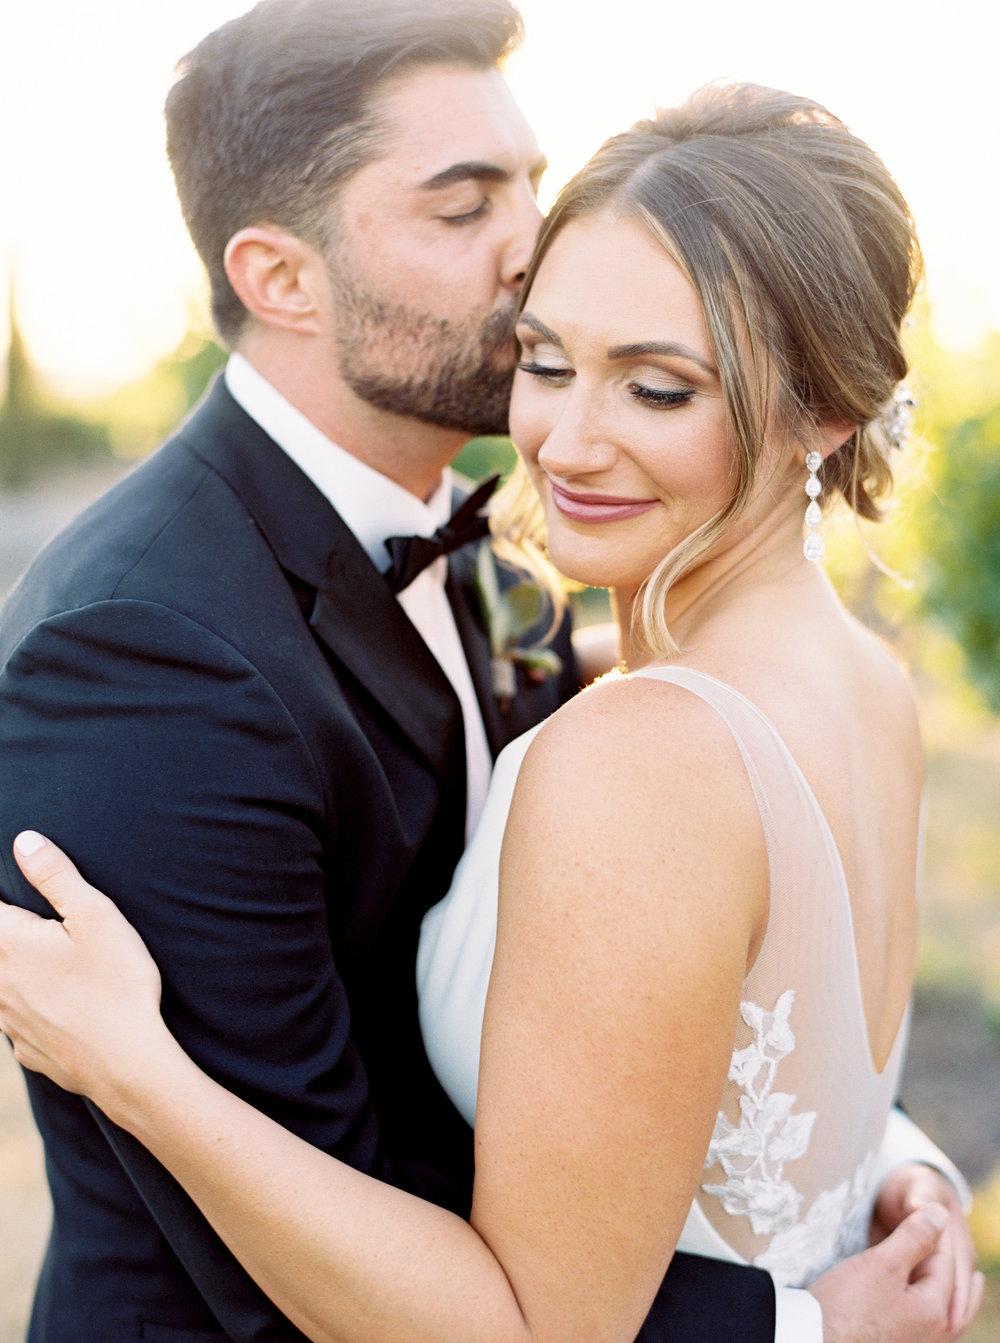 vintners-inn-wedding-in-santa-rosa-california-204.jpg